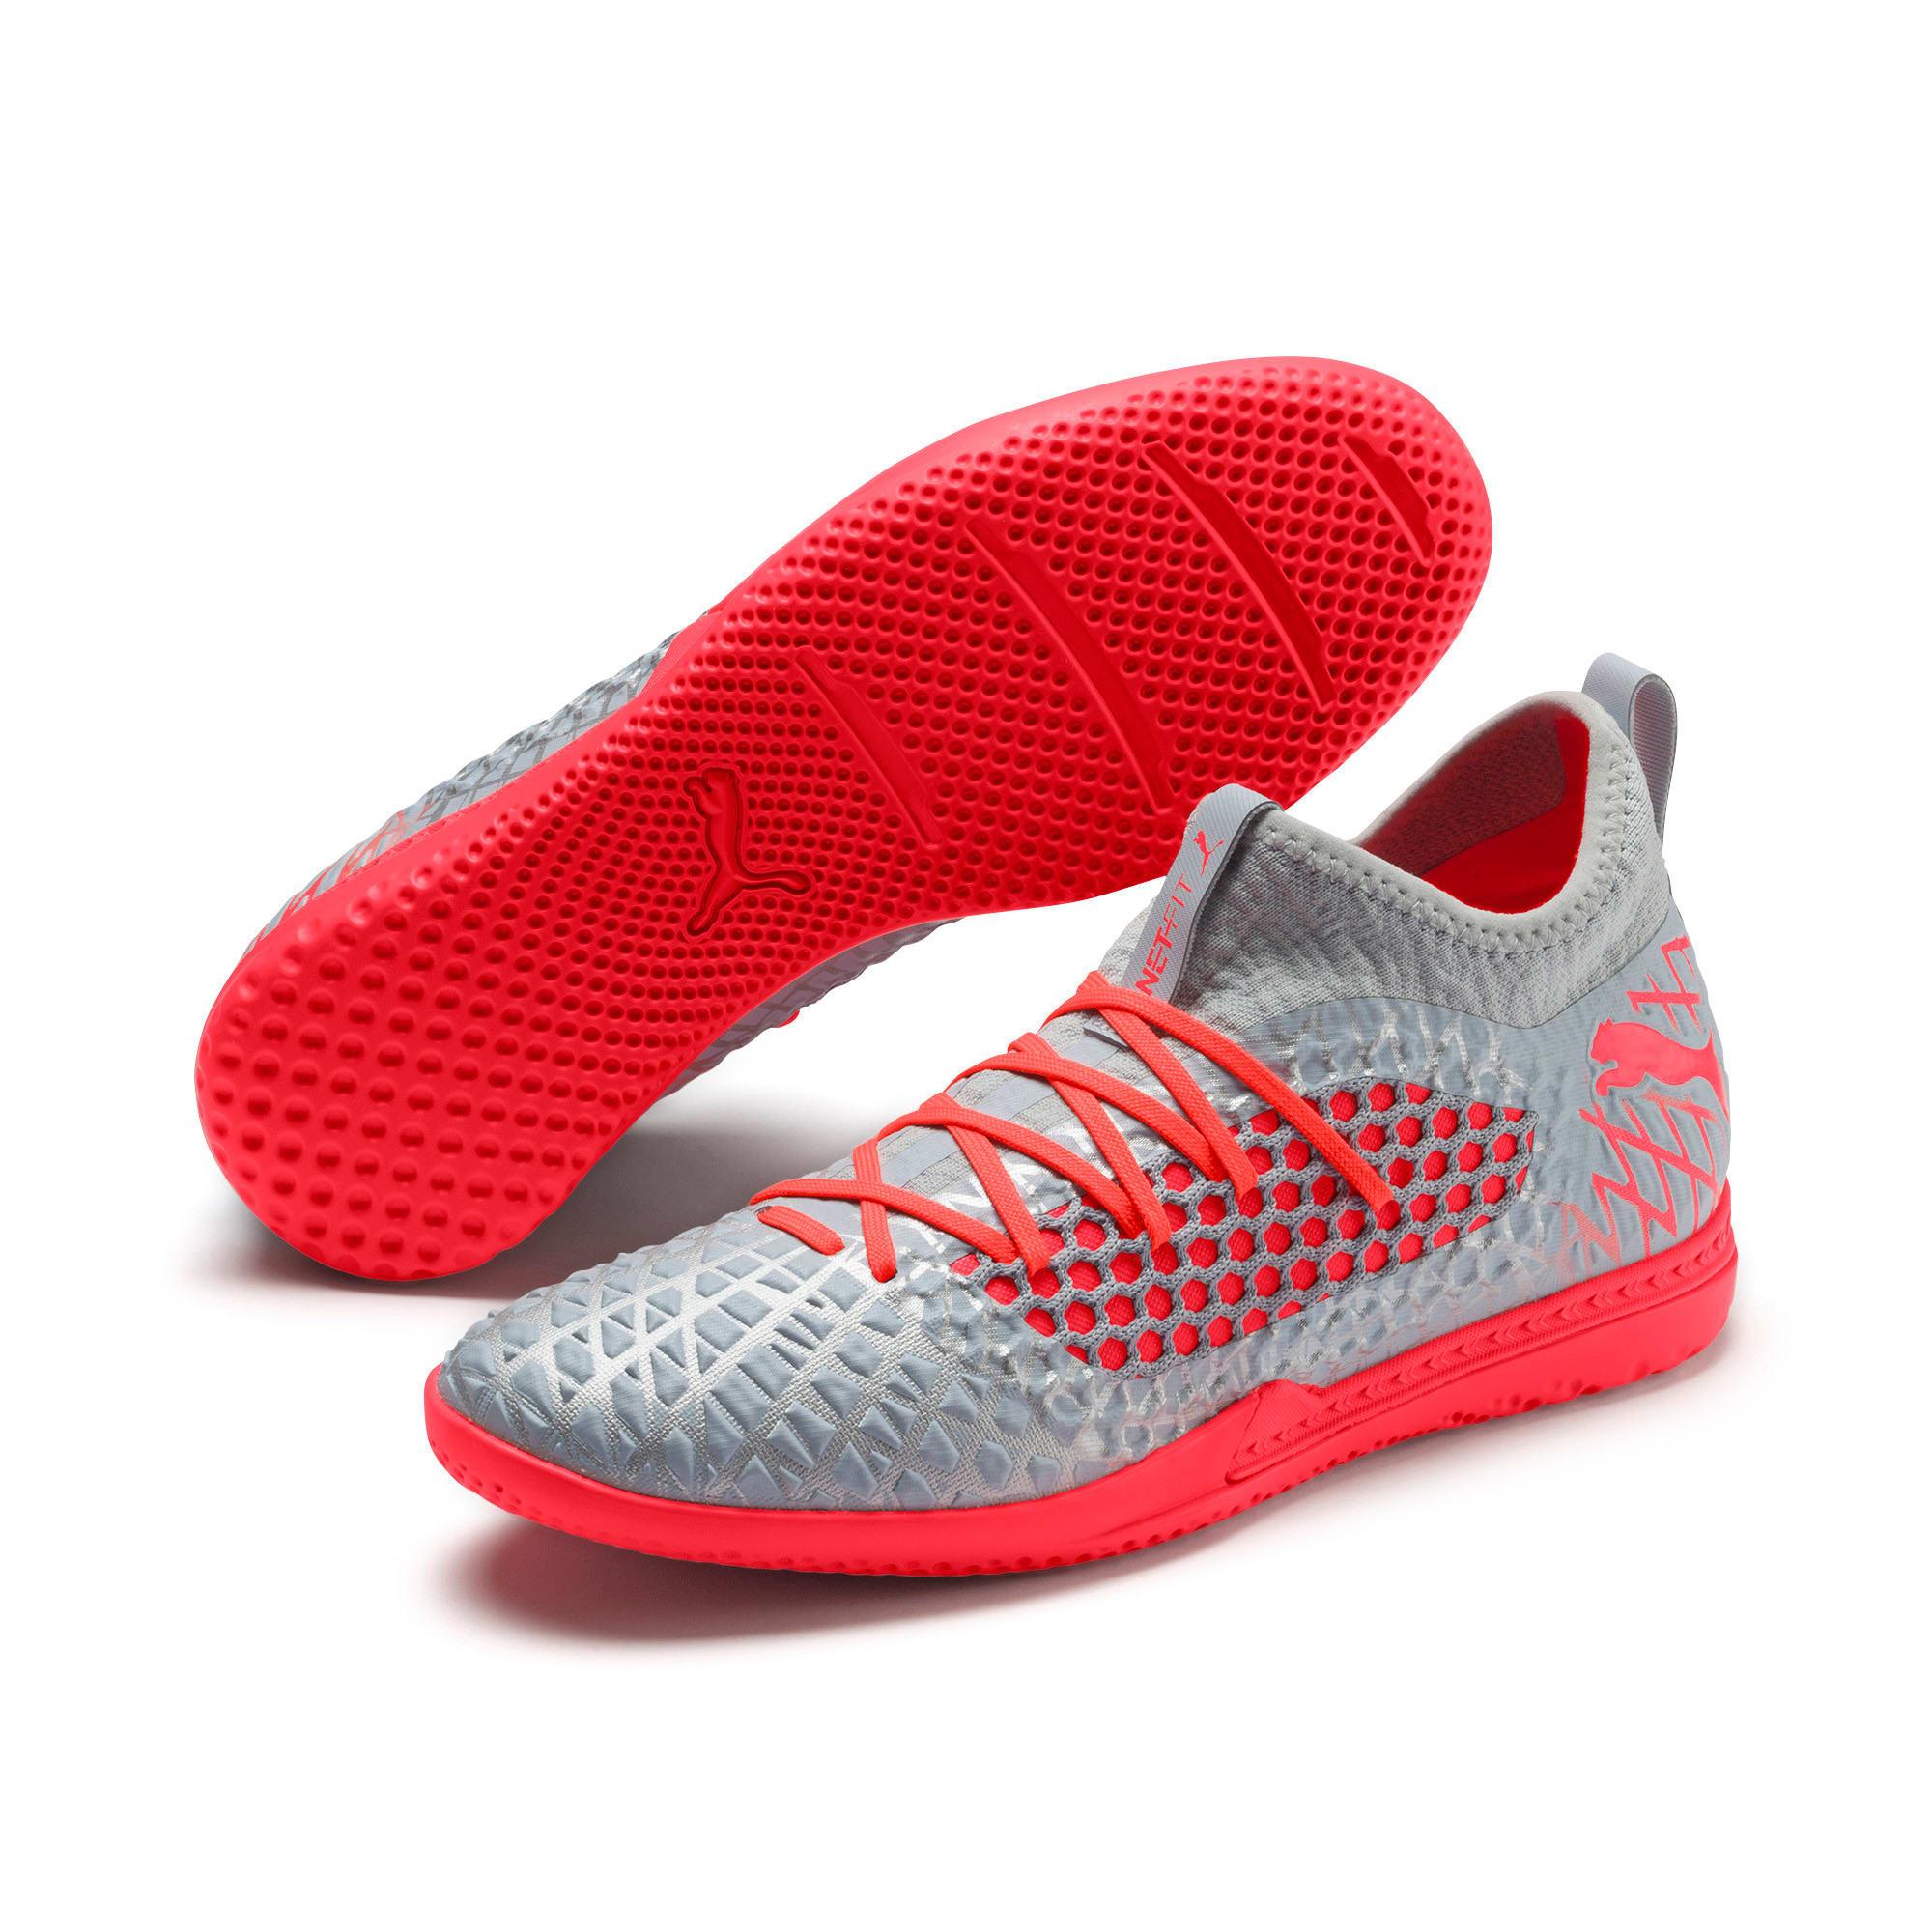 Thumbnail 3 of FUTURE 4.3 NETFIT IT Men's Soccer Shoes, Glacial Blue-Nrgy Red, medium